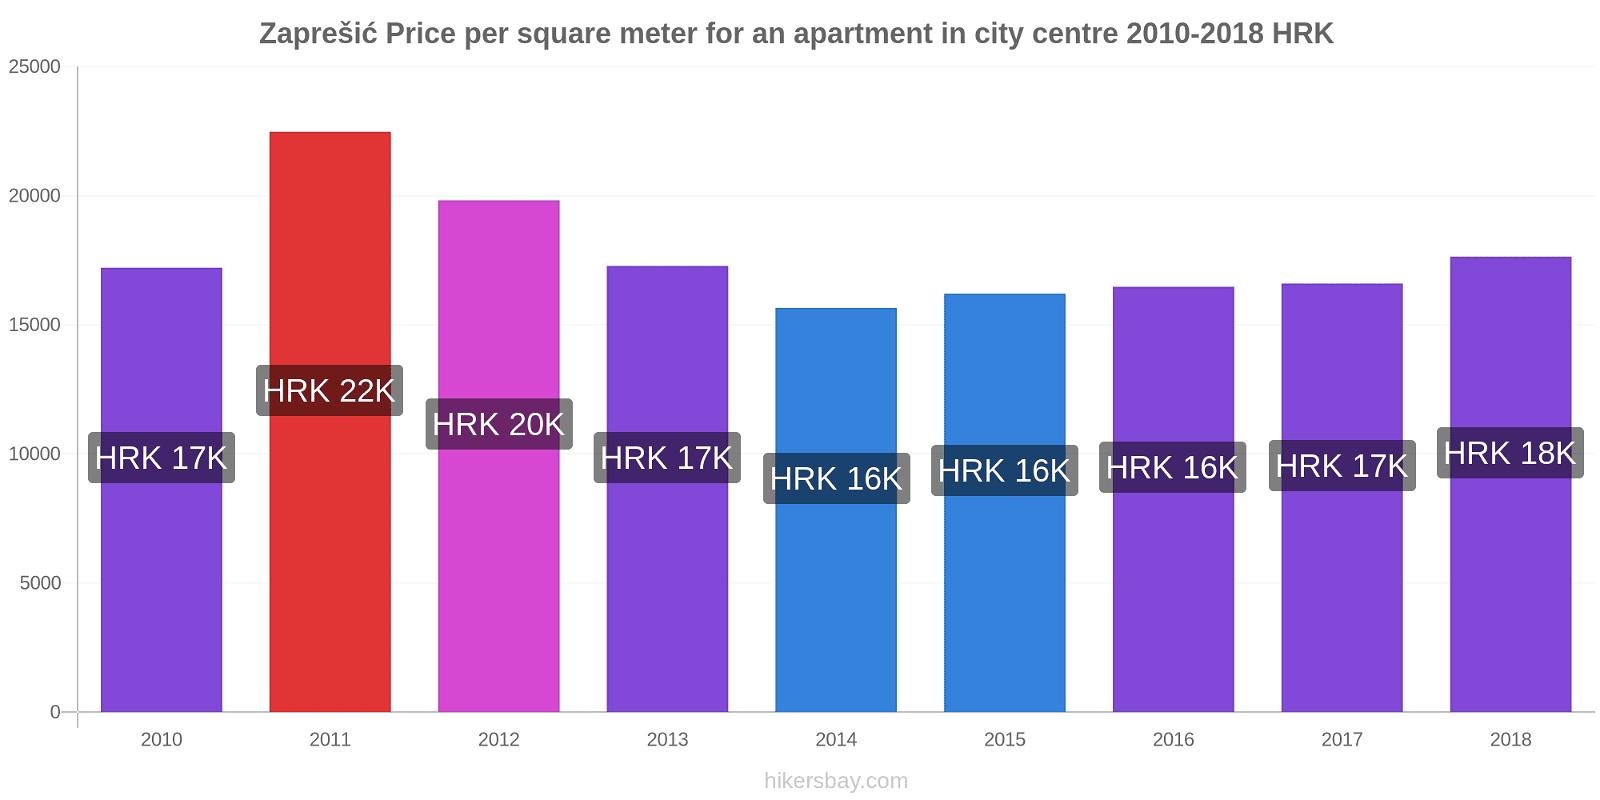 Zaprešić price changes Price per square meter for an apartment in city centre hikersbay.com